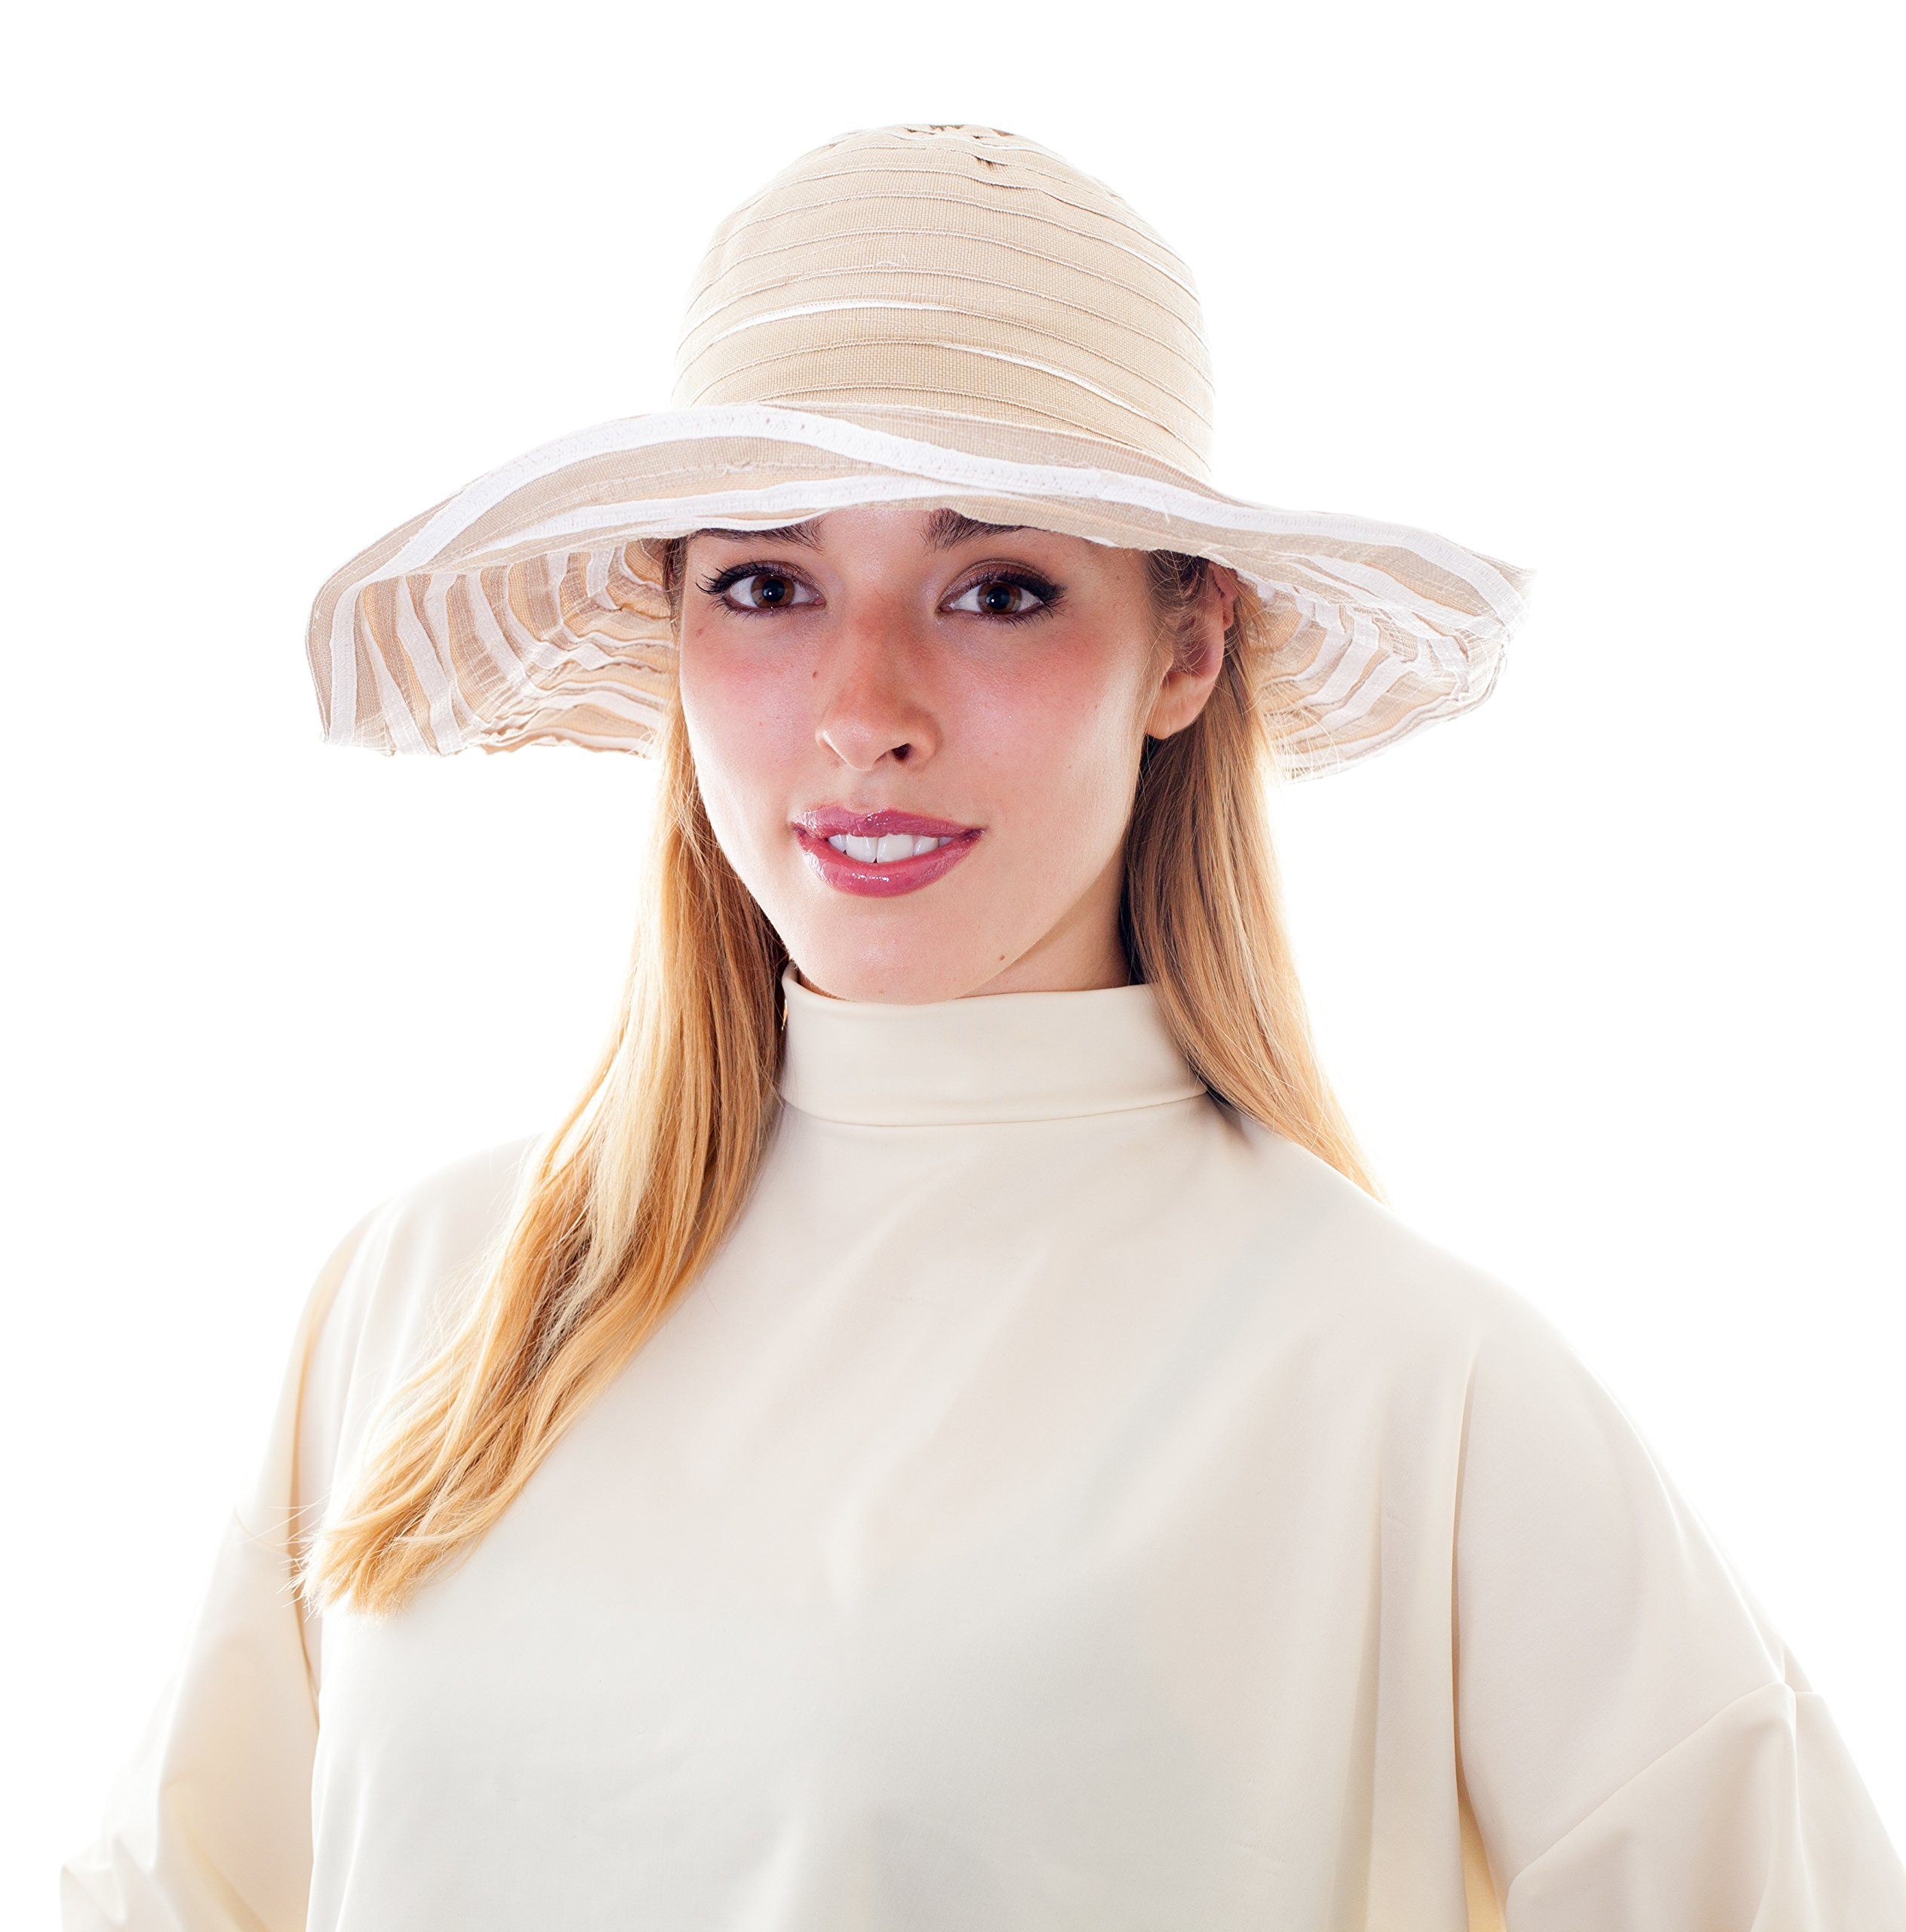 Sunwrap Cooling UPF 50+ Sun Protection Shawl UV Body Wrap Protection for Face, Chest, Neck, Back, Arms, Shoulders - Sunscreen Like Scarf, Bolero, Bandana, Arm Sleeves (Tan/Cream)